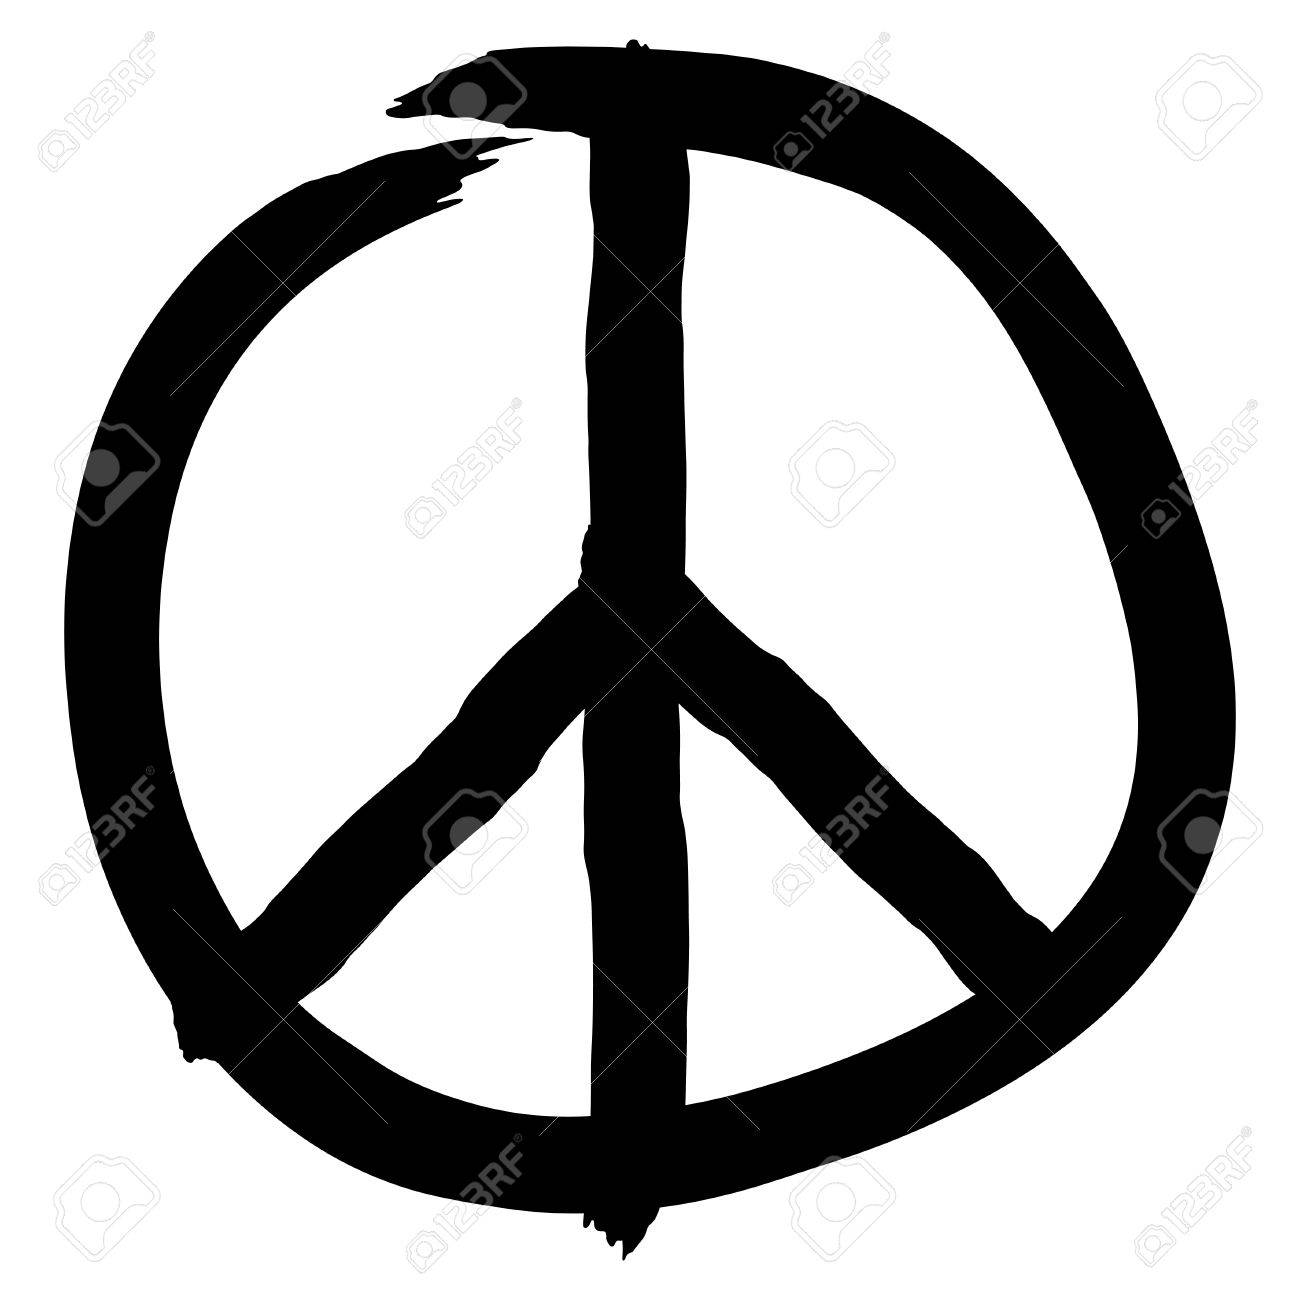 Peace symbol isolated on white background, vector illustration - 32496663